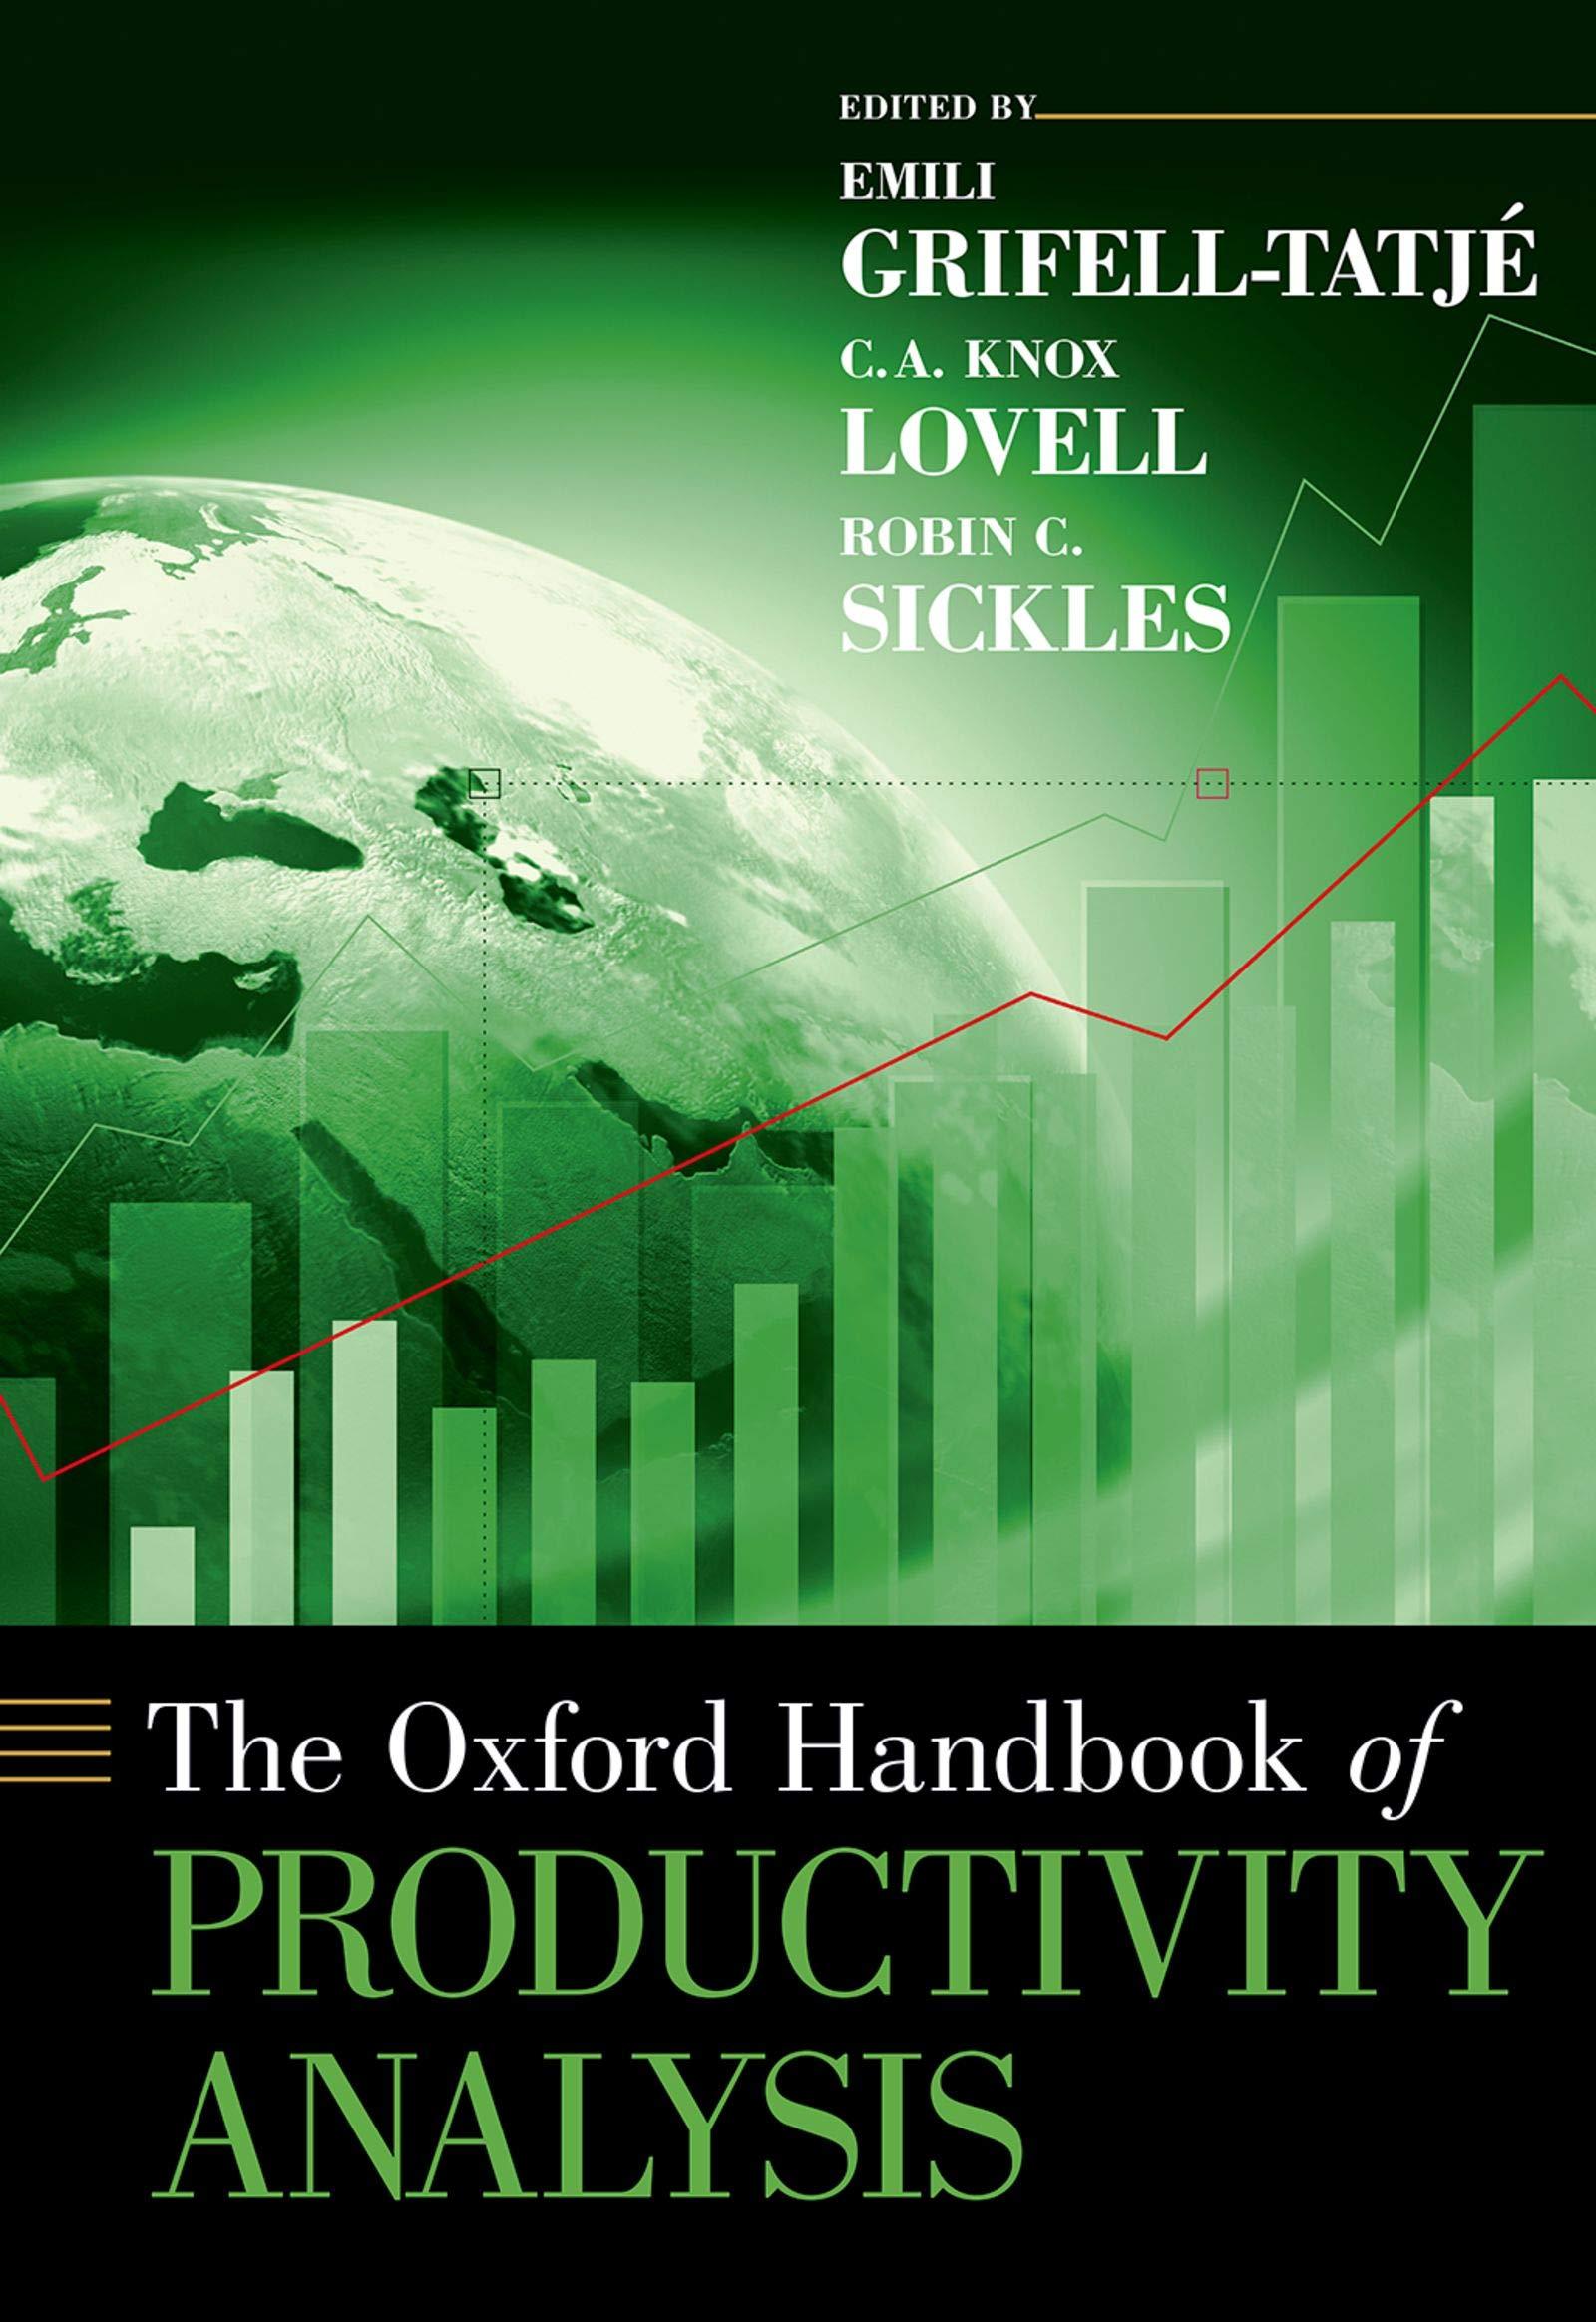 The Oxford Handbook of Productivity Analysis (Oxford Handbooks)